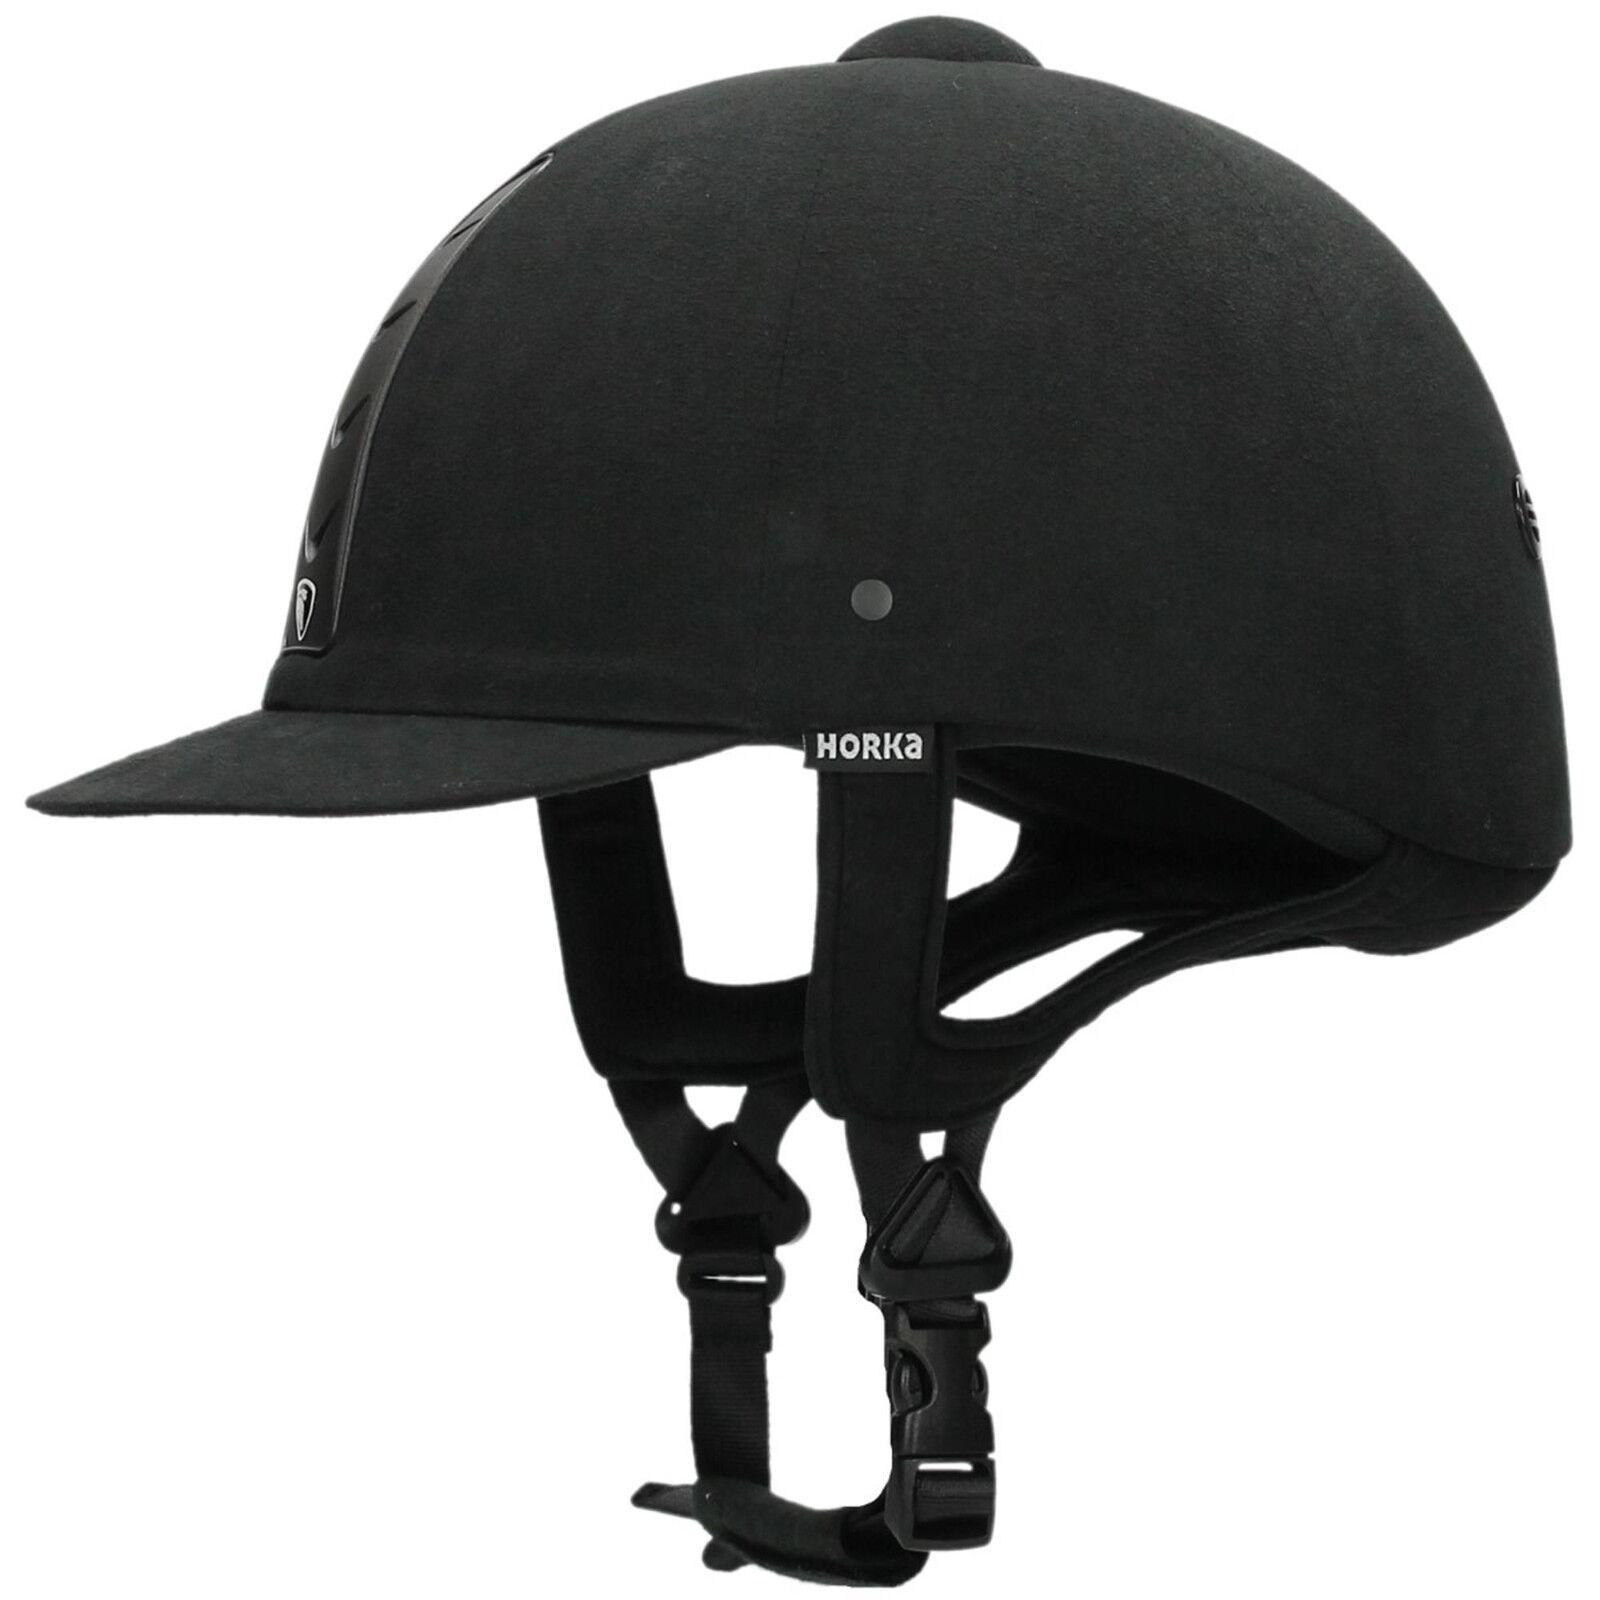 HORKA HAWK Reitkappe, Sicherheitsreithelm, black Gr. 56